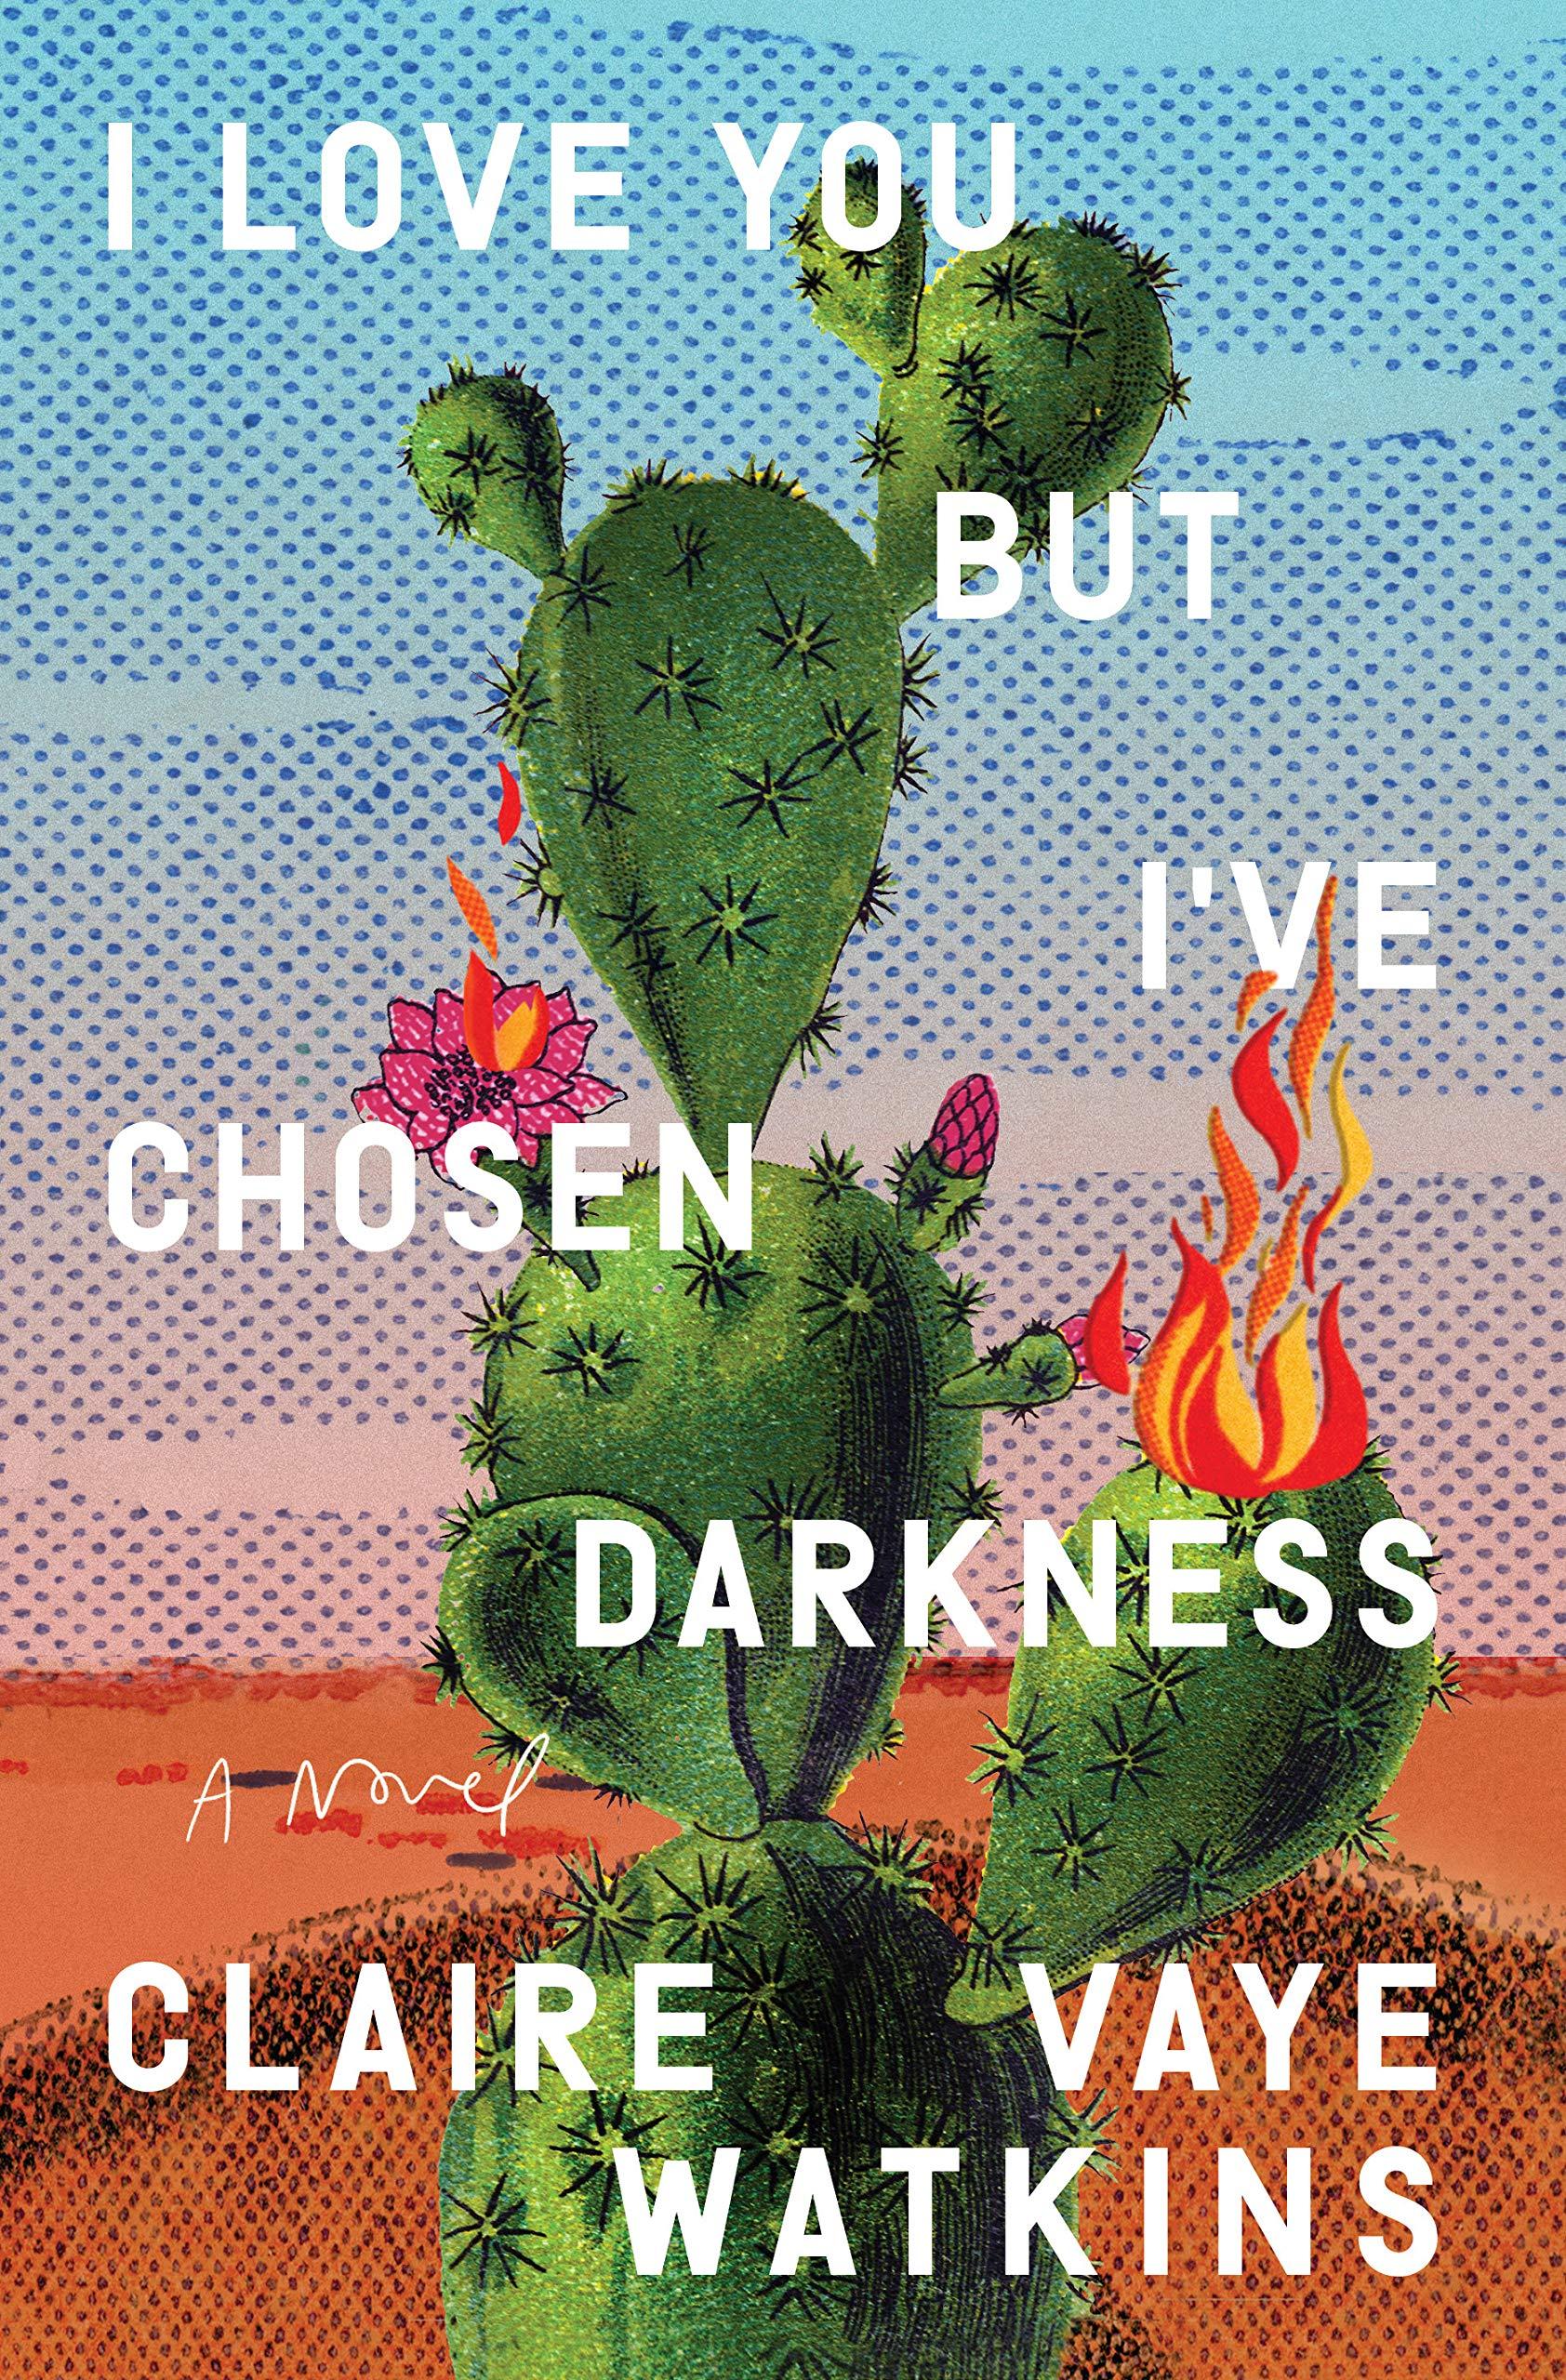 Amazon.com: I Love You but I've Chosen Darkness: A Novel: 9780593330210:  Watkins, Claire Vaye: Books